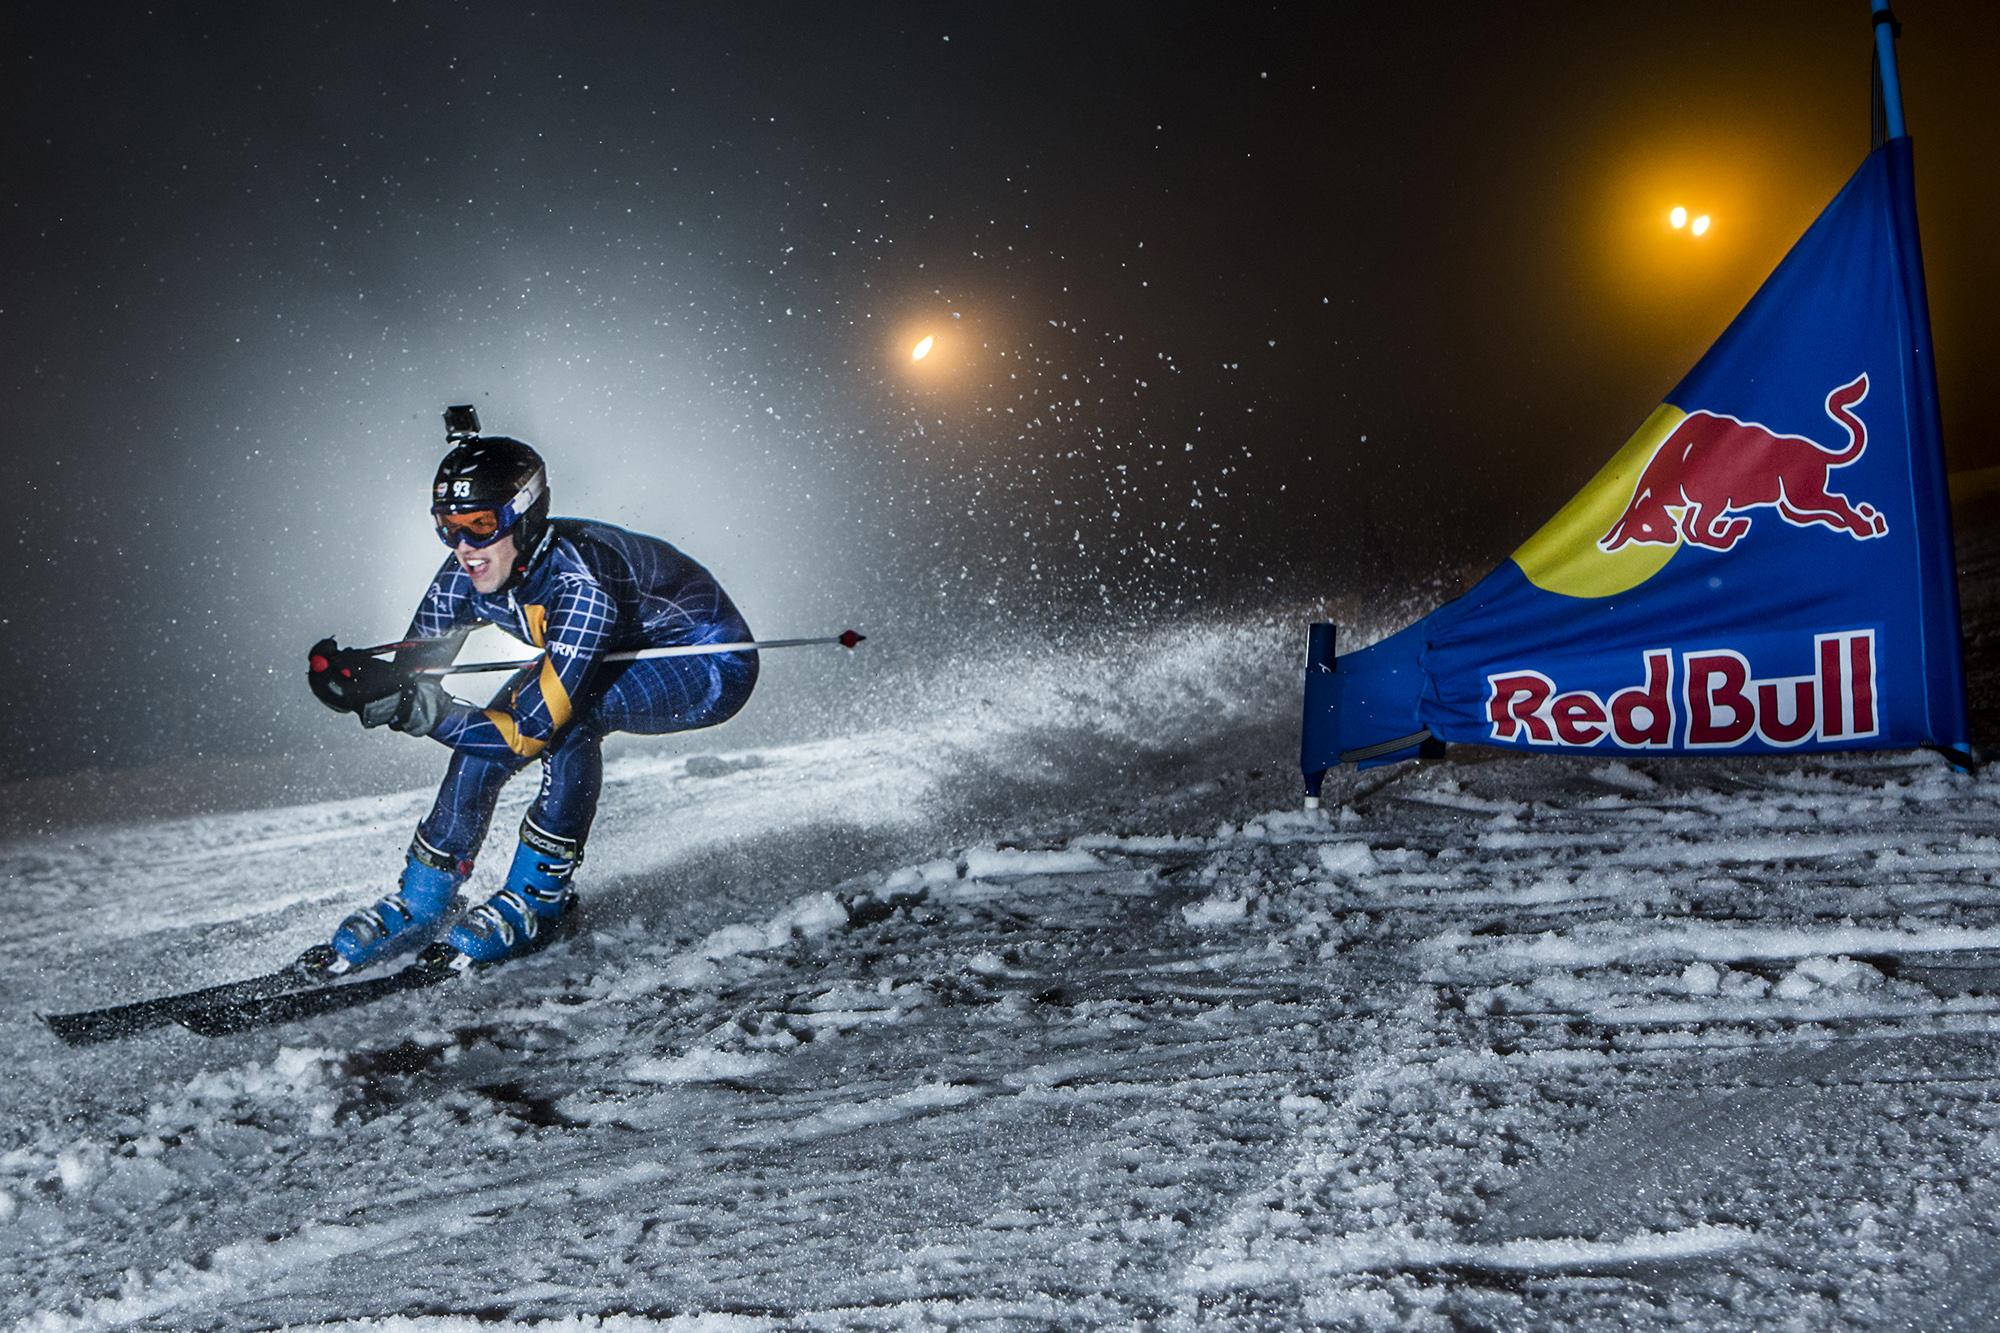 Red Bull_Content_Pool_Red_Bull_Zjazd_Na_Krech_Zakopane_fot._M_Kin_2